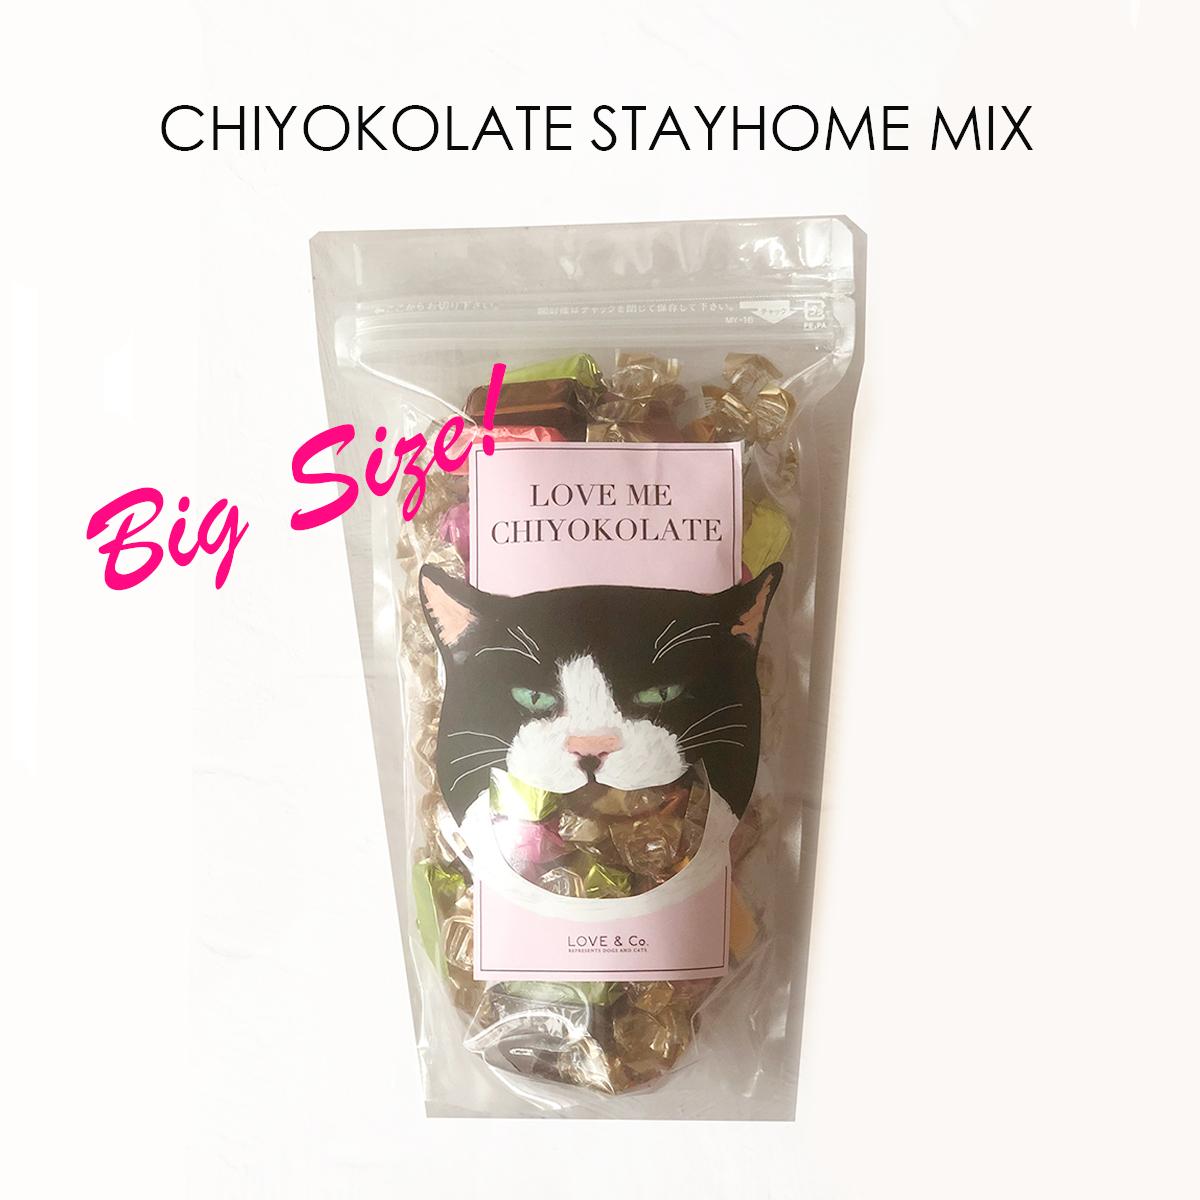 LOVE ME CHIYOKOLATE STAYHOME MIX ( BIG SIZE )   *クール便対象*画像